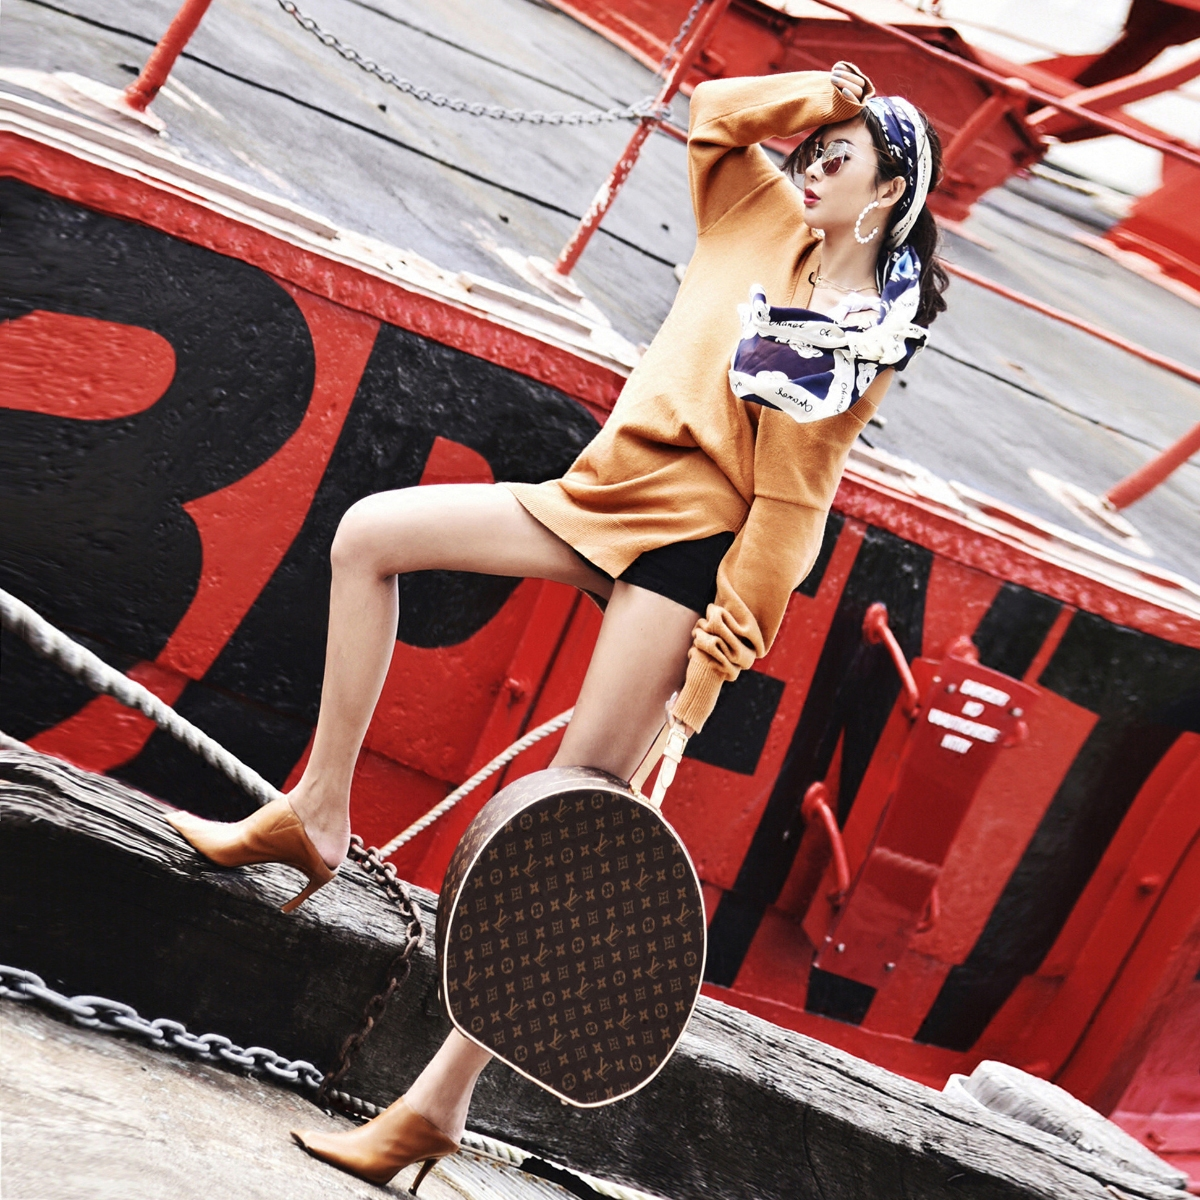 BettyChow度假系列 18春夏金驼色V领褶皱套头毛衣连衣裙 内含背心